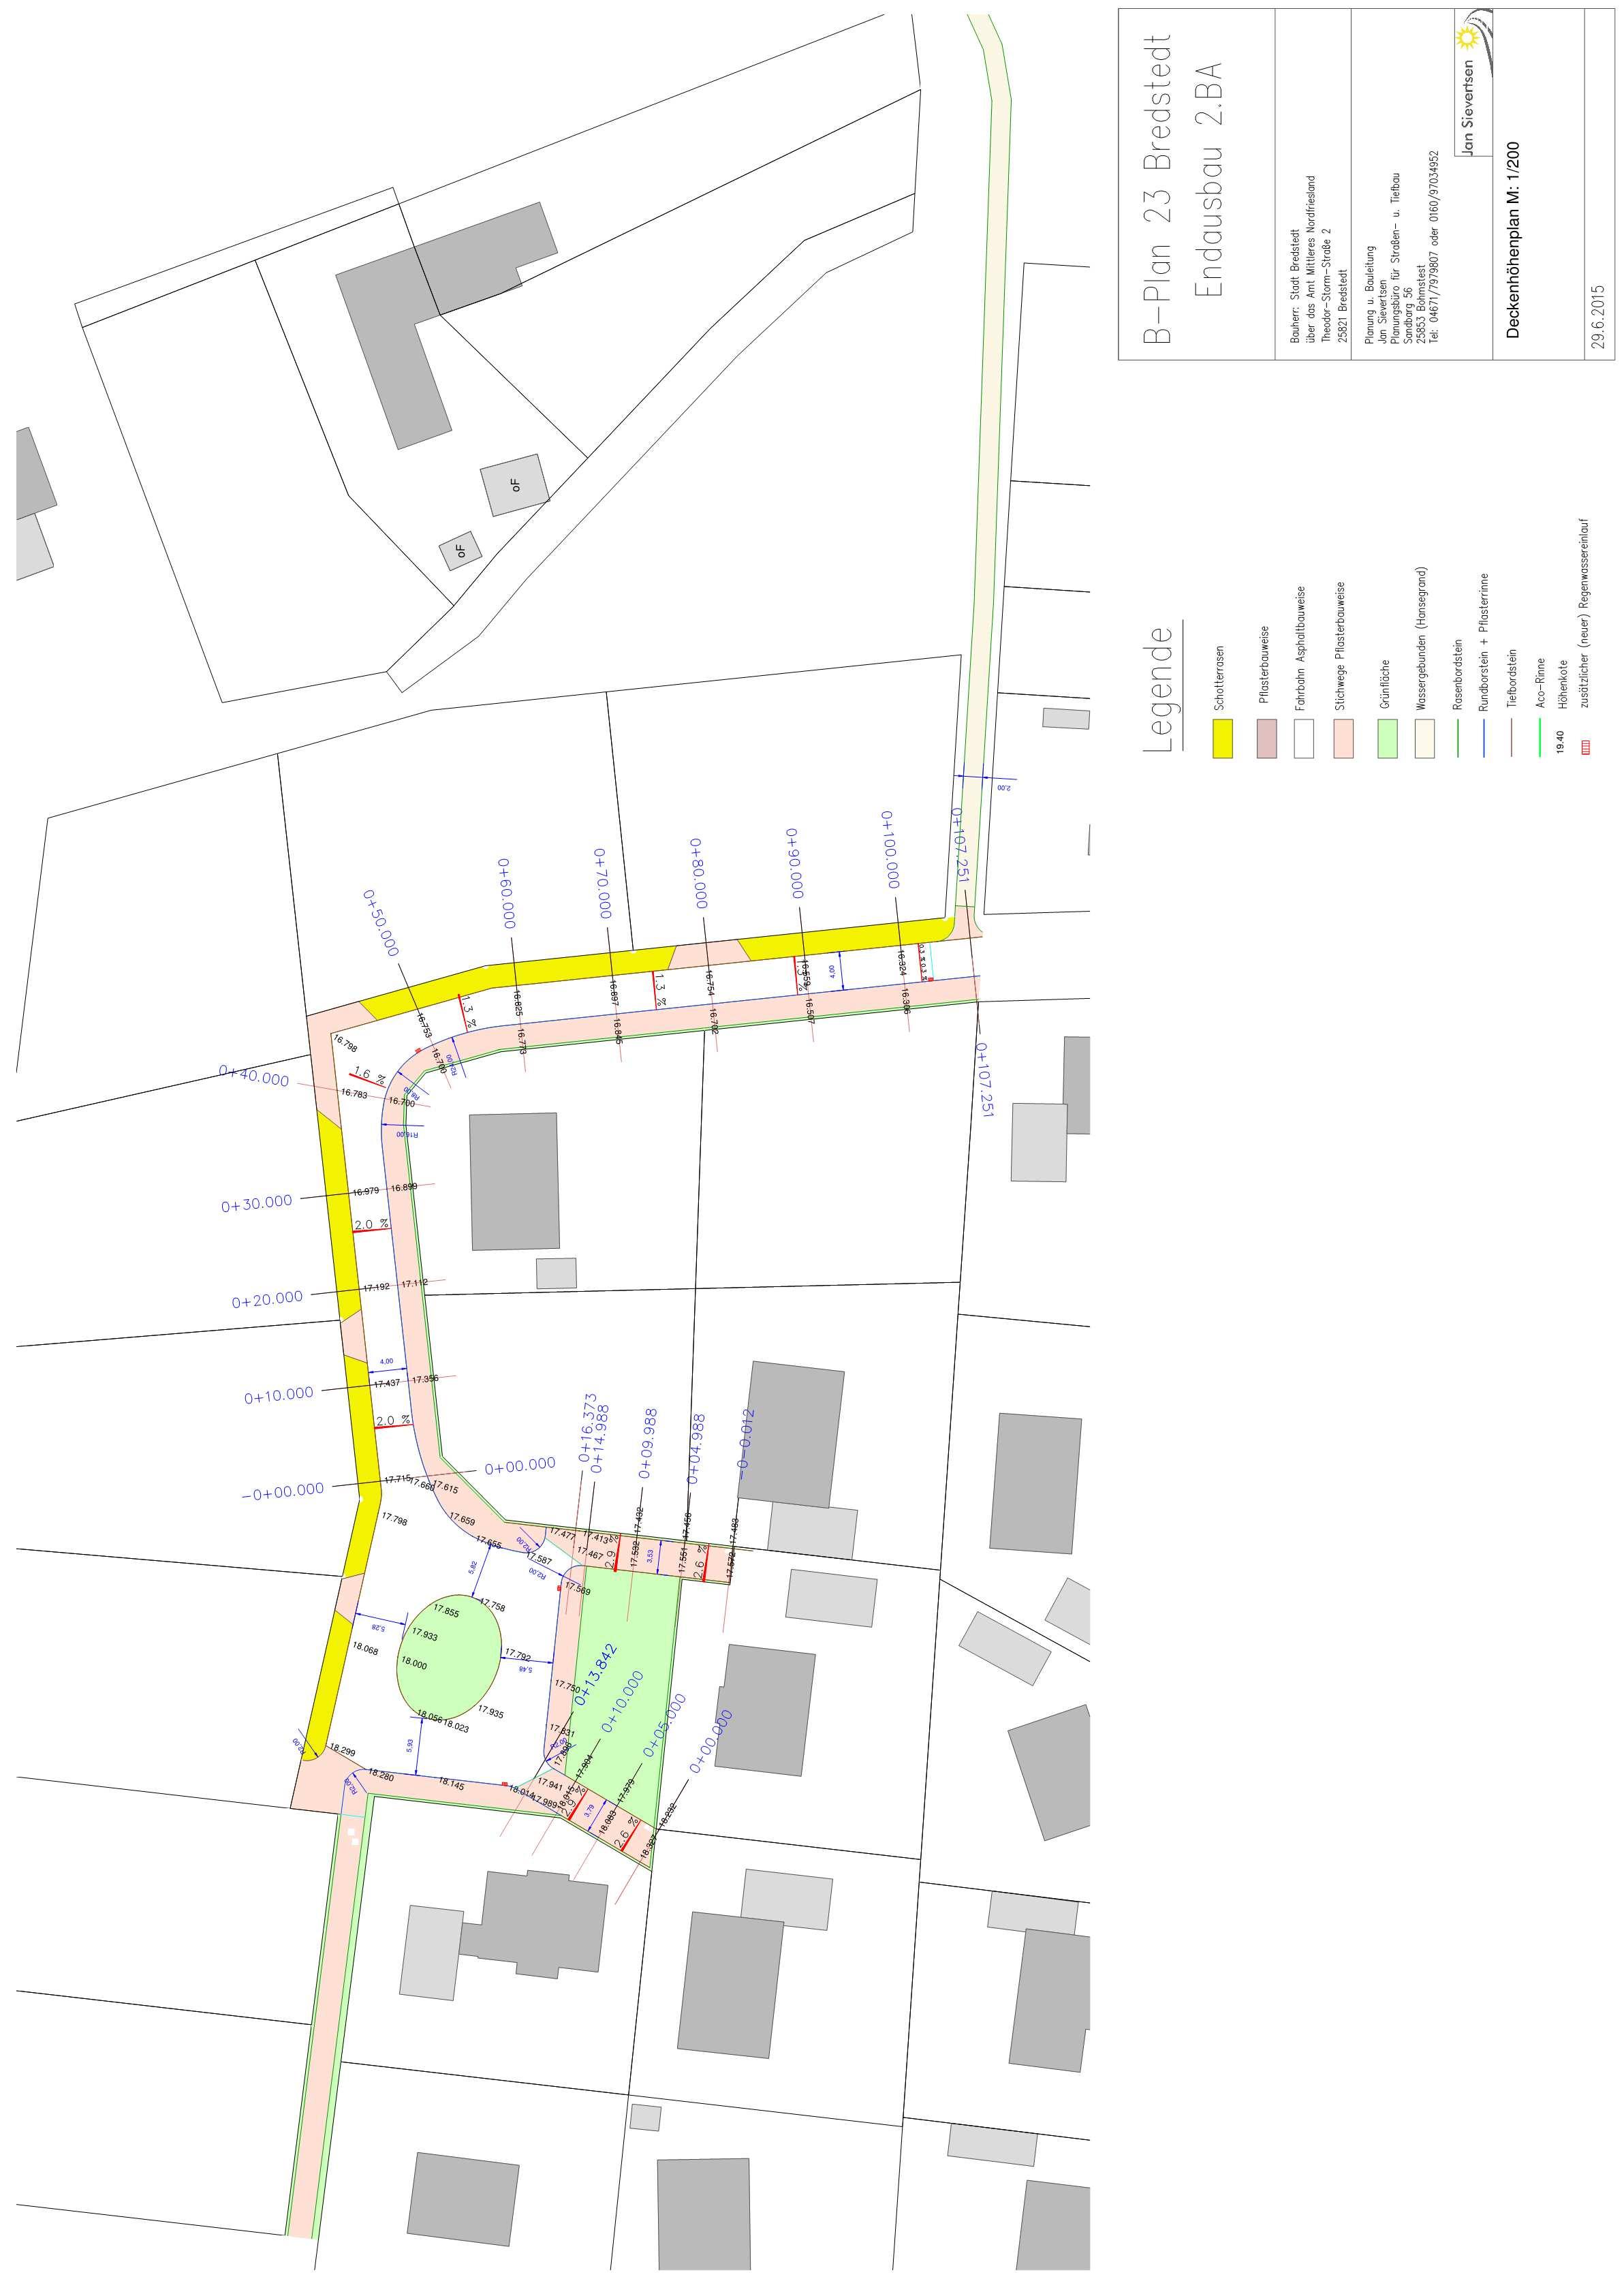 Endausbau B-Plan 23 in Bredstedt